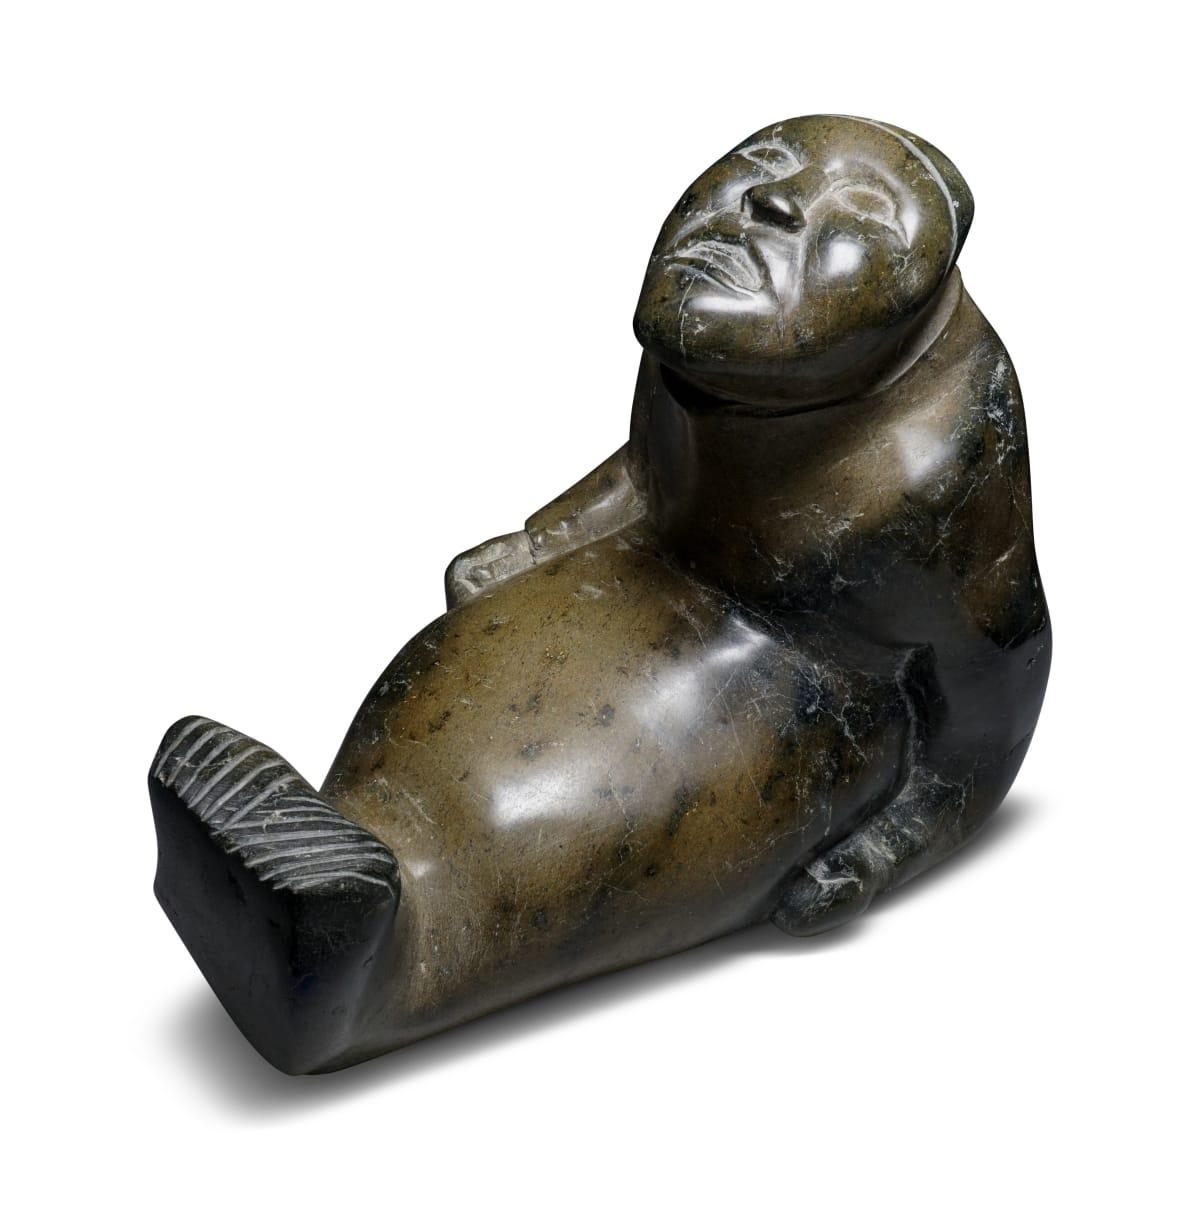 LOT 27 Possibly: TAYARAQ TUNNILLIE (1934-2015) KINNGAIT (CAPE DORSET) Shaman Seal Transformation stone, 12 3/4 x 9 x 14 in (32.4 x 22.9 x 35.6 cm) ESTIMATE: $2,000 — $3,000